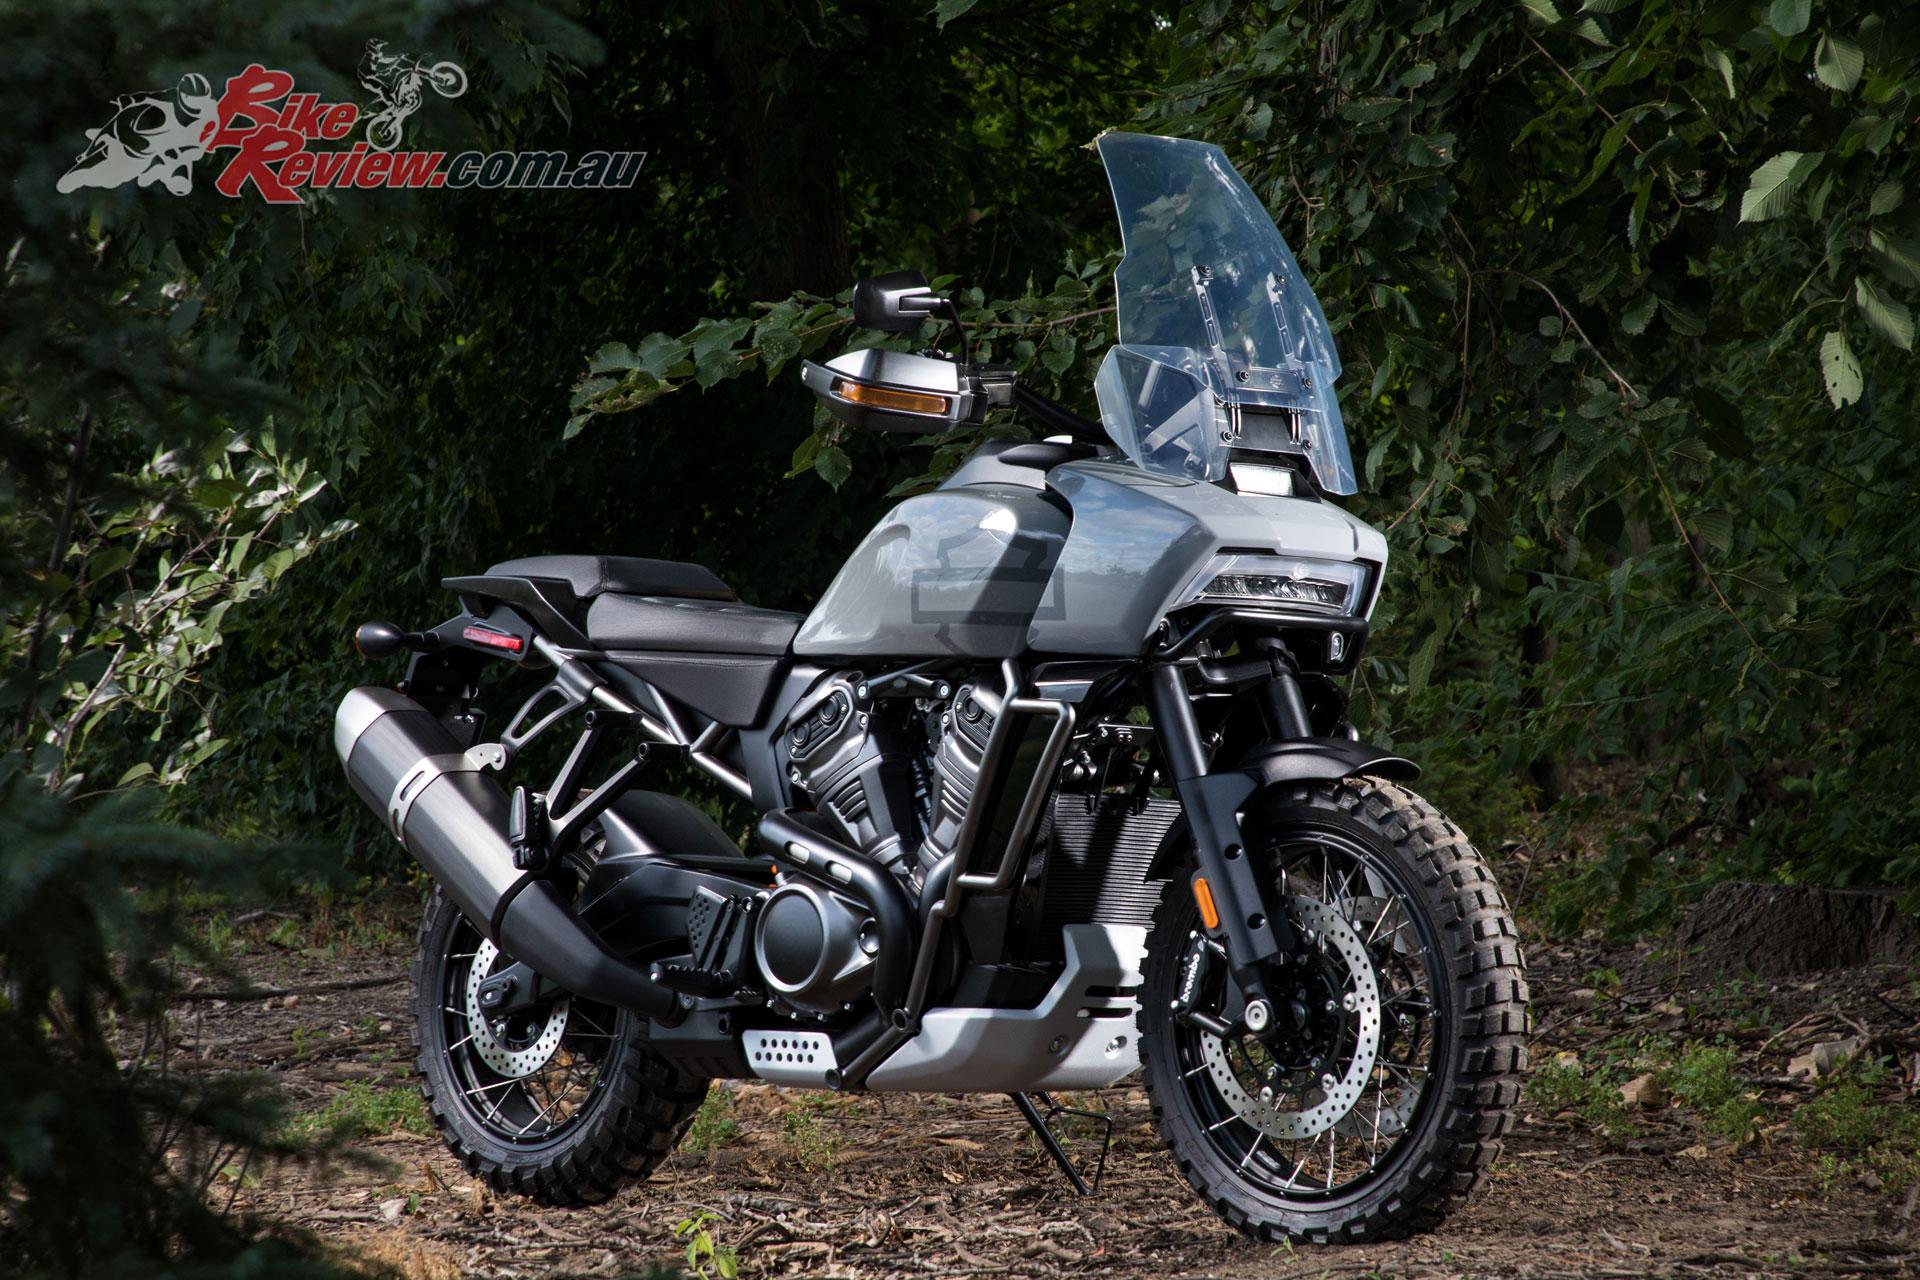 Harley-Davidson's concept Pan America 1250 Adventure Tourer